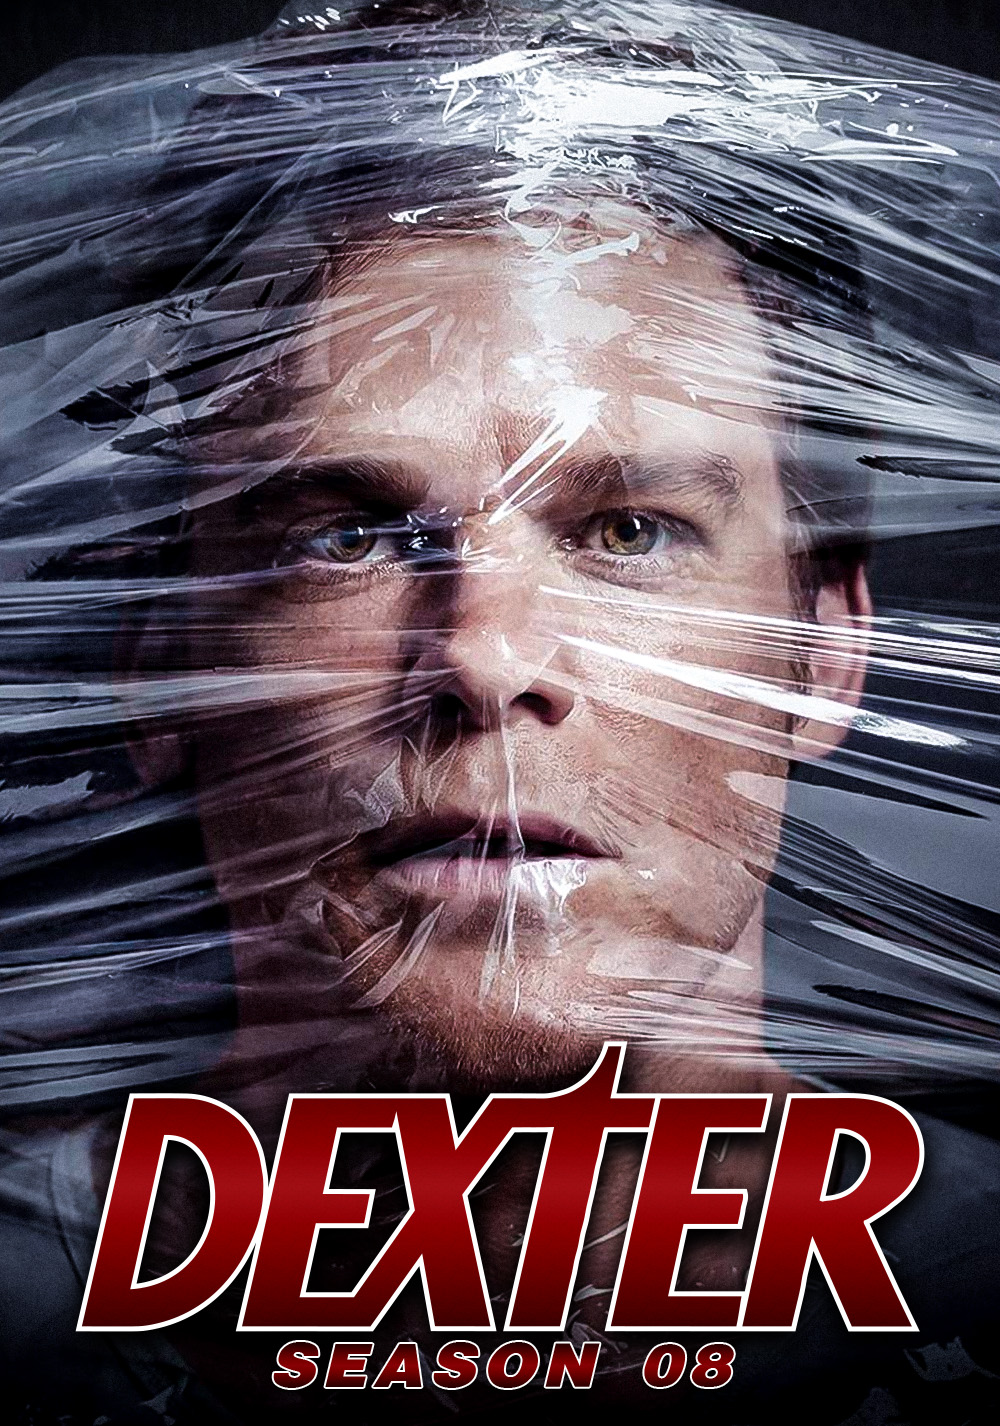 Dexter|Colección 1-8|Latino-Ingles|1080p|96/96|x265 10bit|+ Soundtracks  Season08-poster